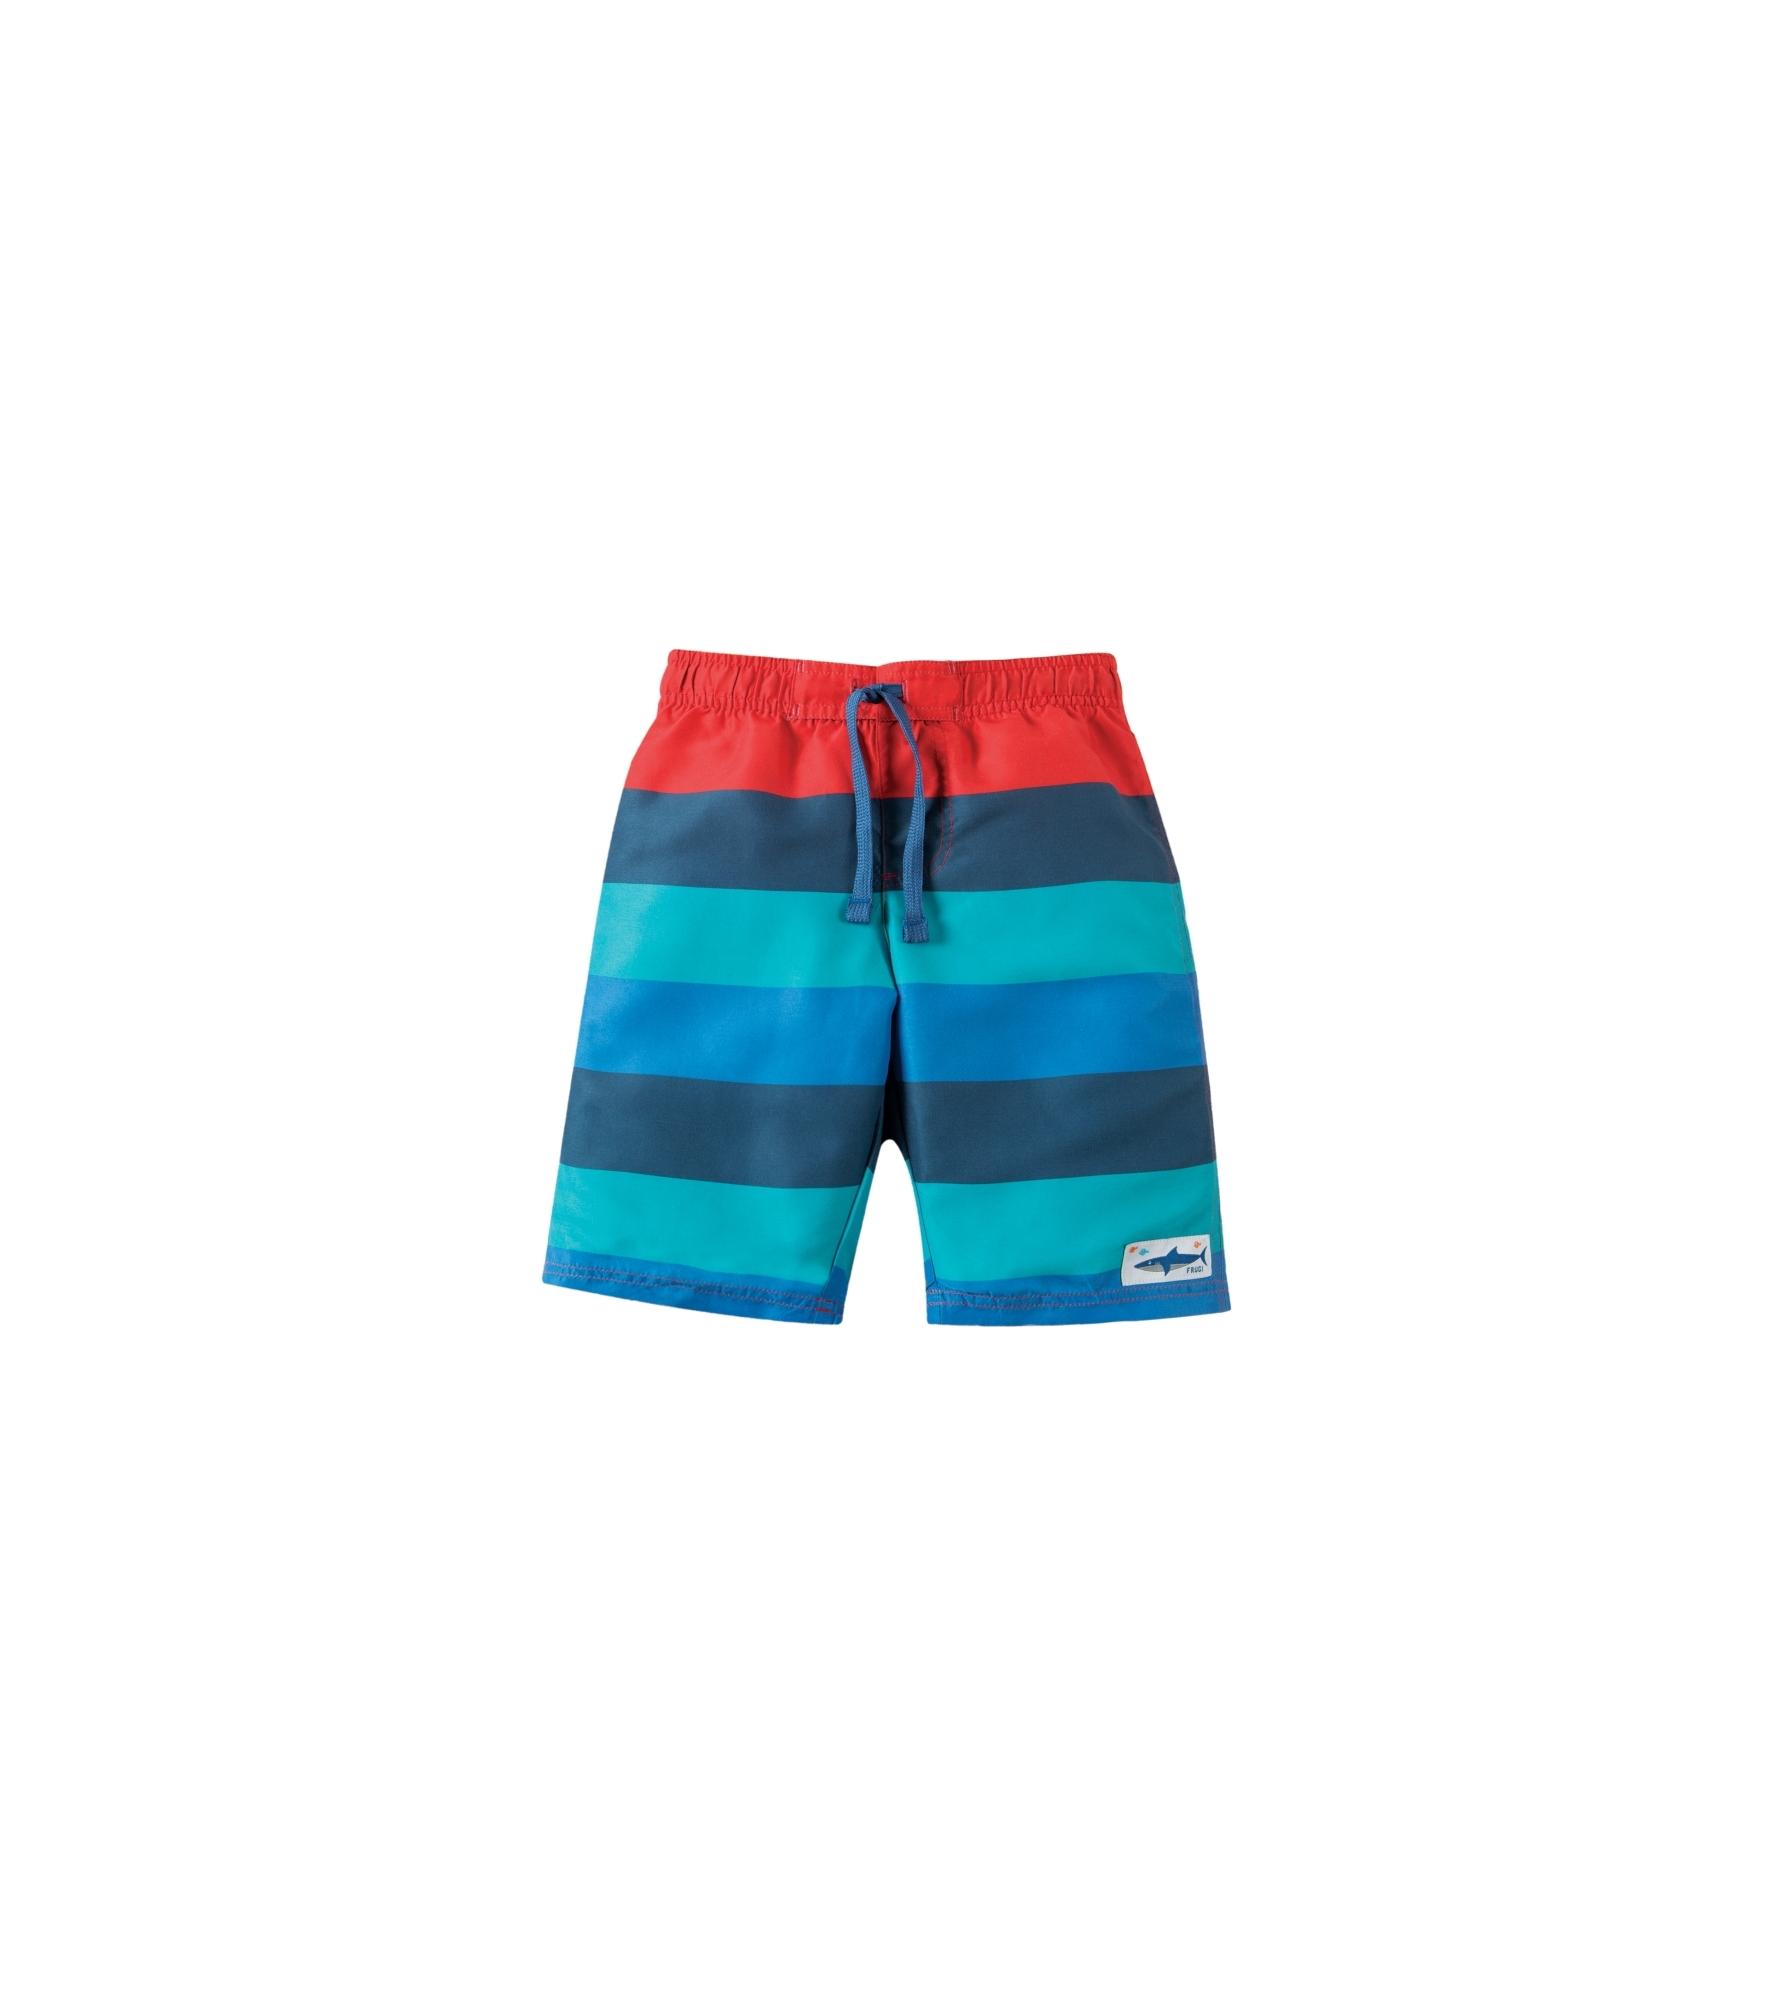 frugi-board-shorts-swim-stripe-45-years-3003759-1600.jpg